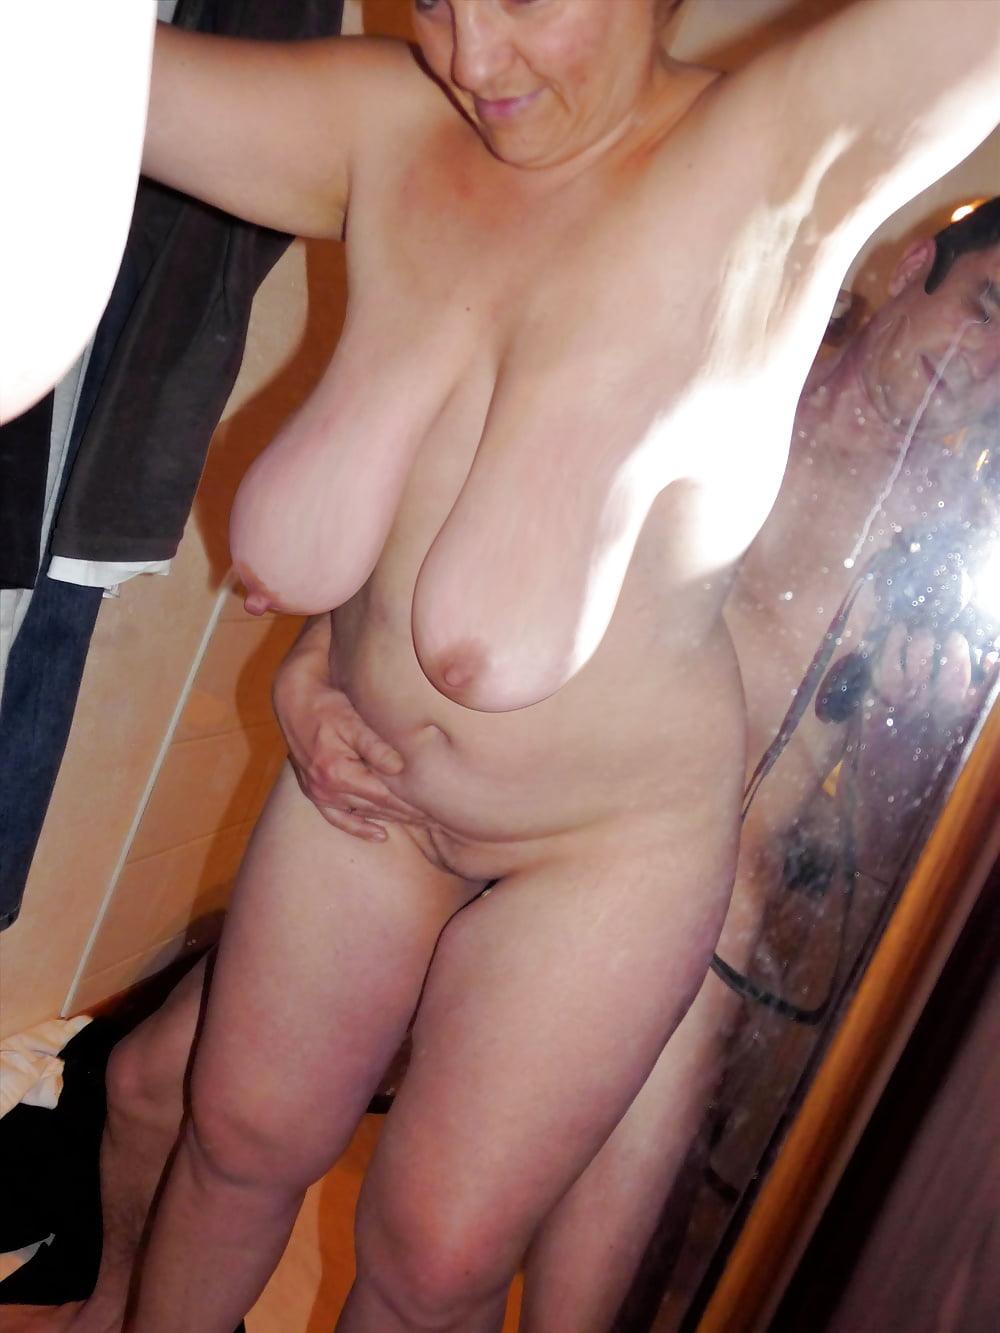 sluts-nude-free-saggy-mature-saggy-boobs-nude